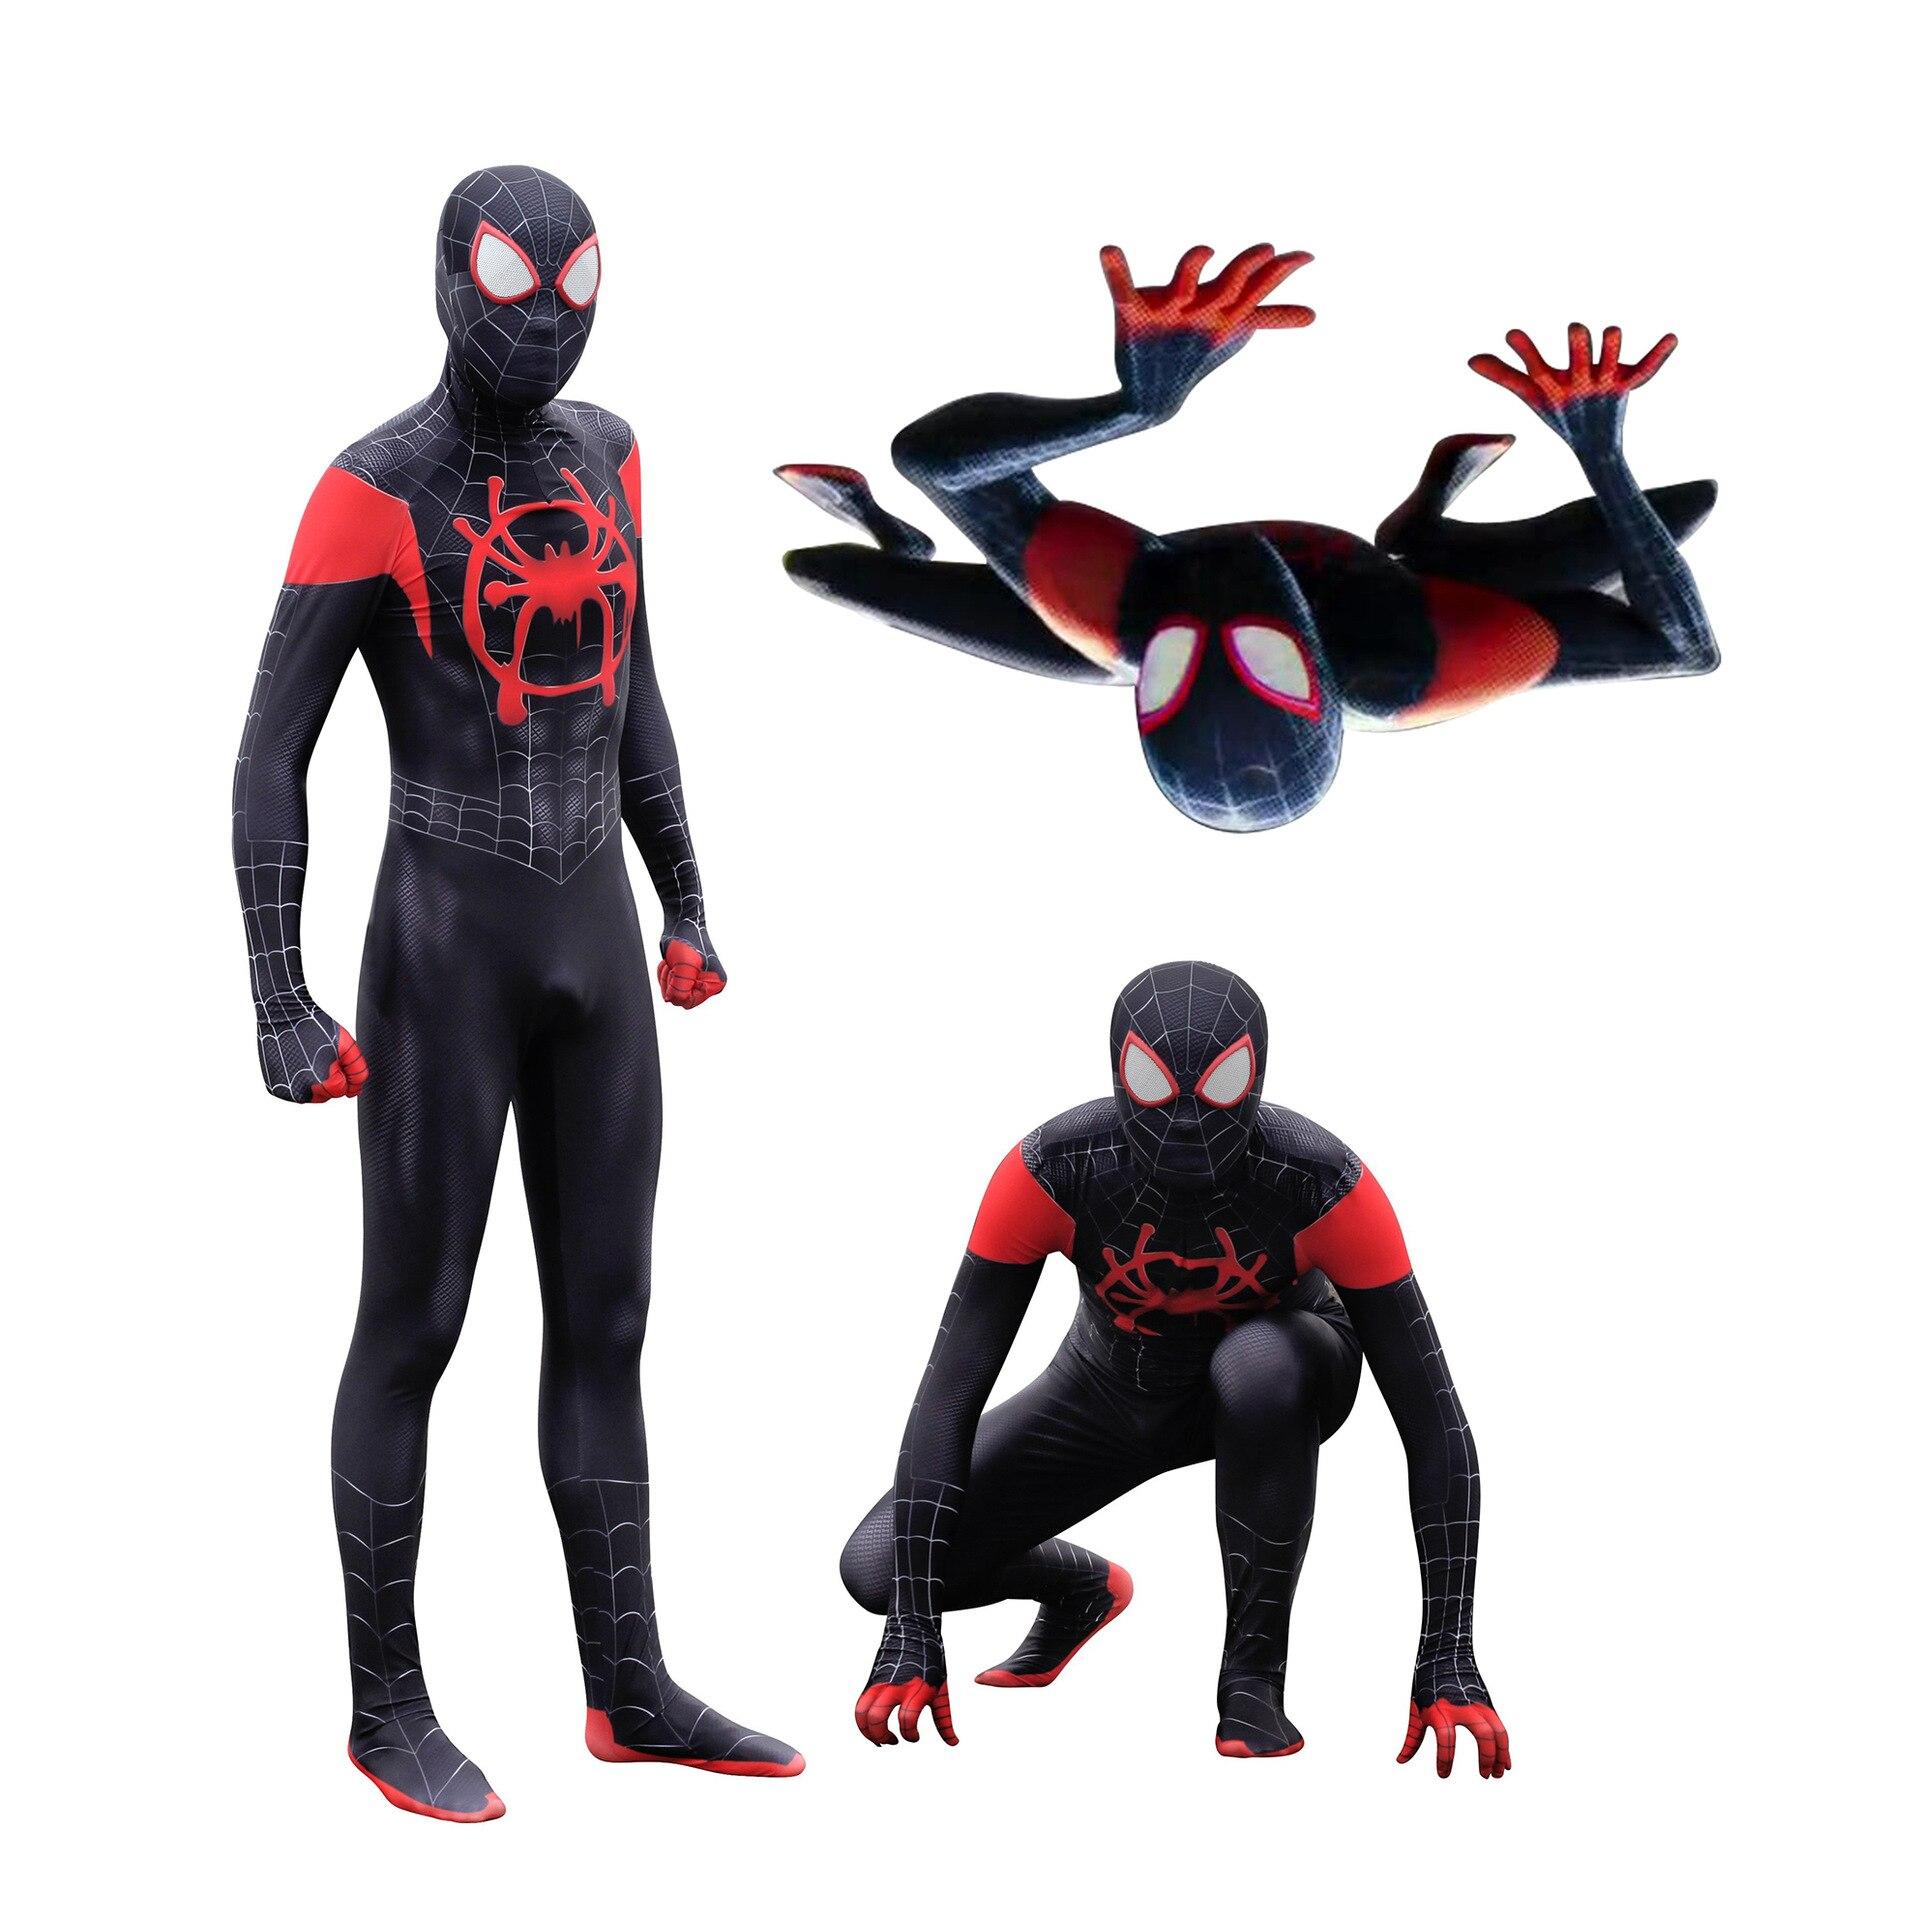 Adult Men Spider-Man Into the Spider-Verse Miles Morales Cosplay Costume Zentai Spiderman Pattern Bodysuit Suit Jumpsuits